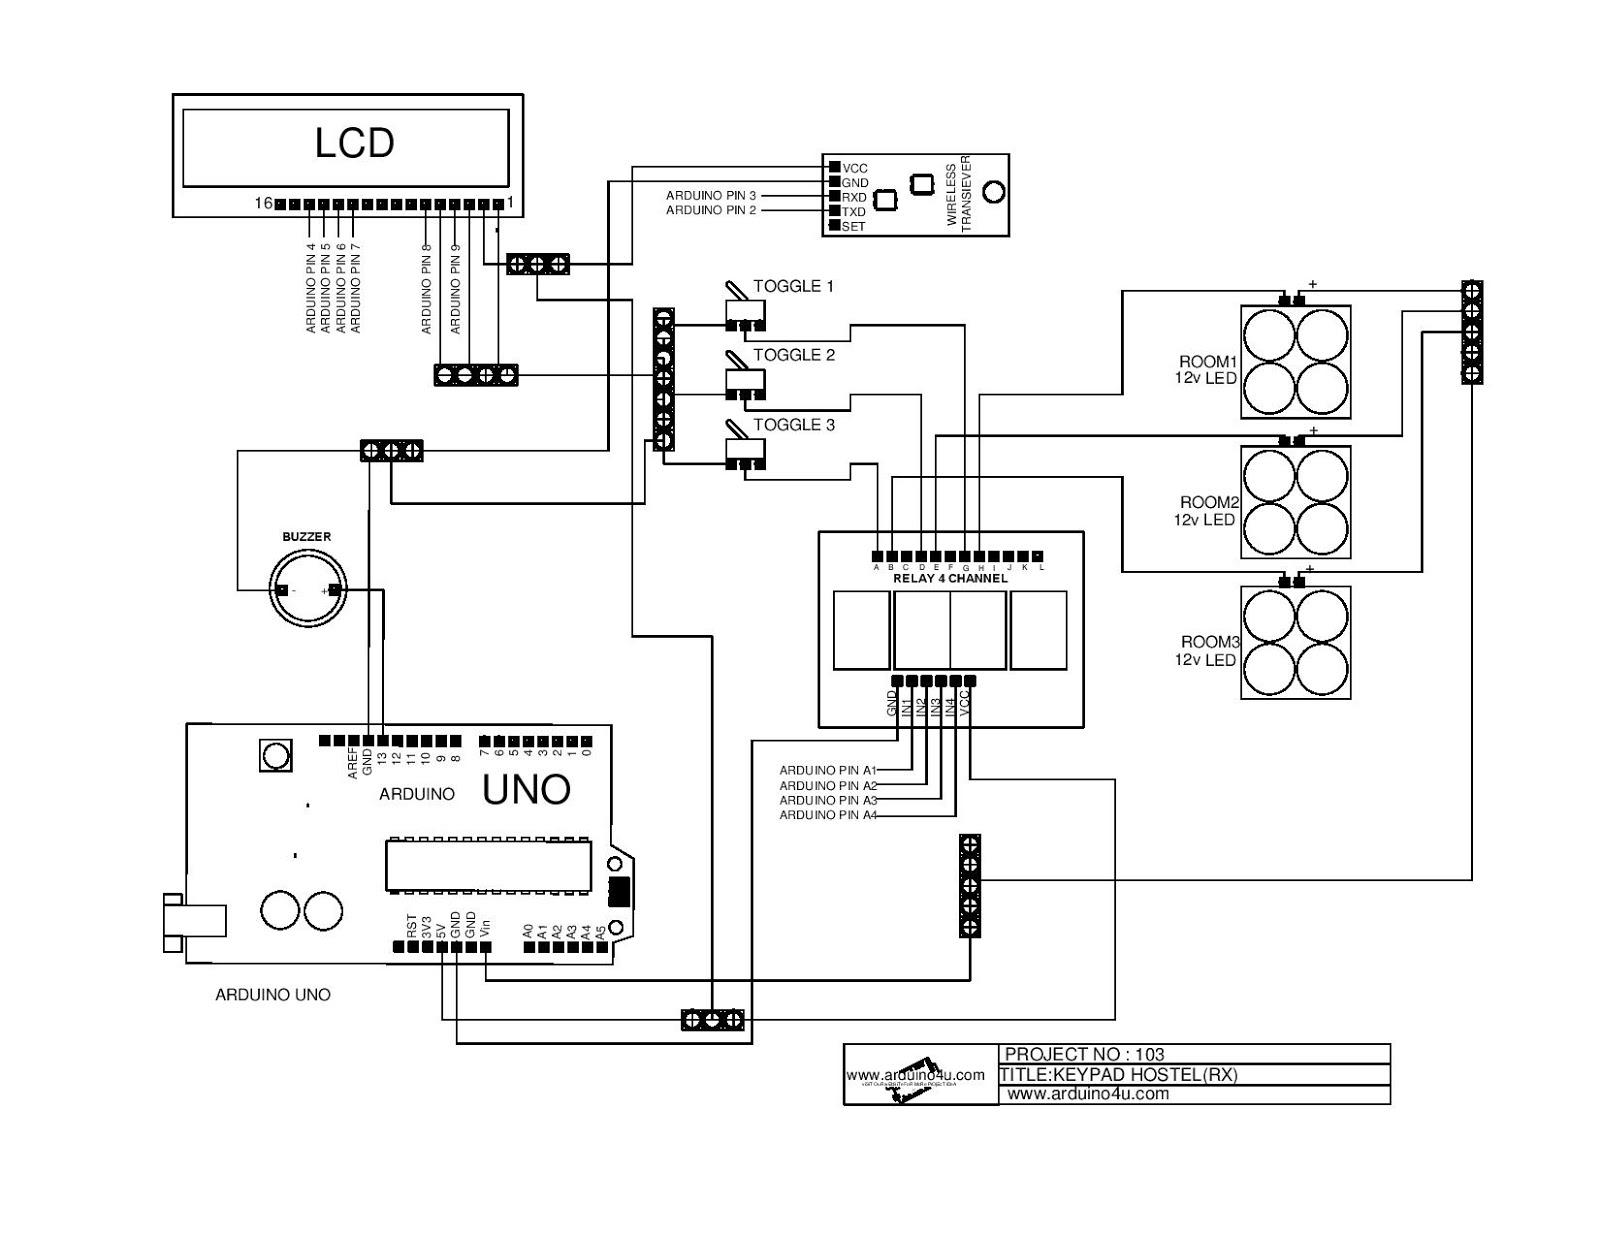 Projek Elektronik Arduino4u 103 Keypad Hostel